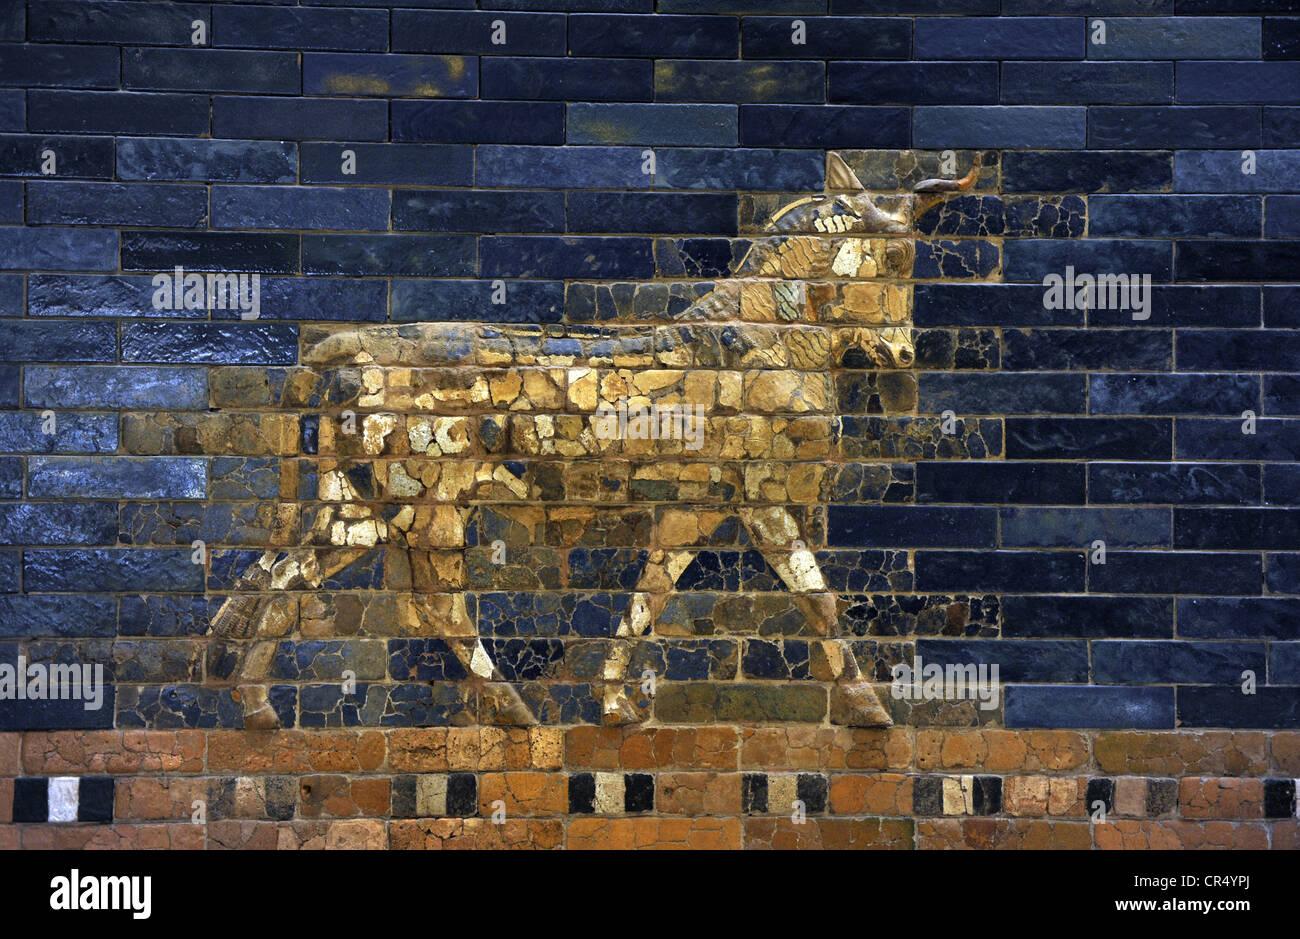 mesopotamian art neo babylonian ishtar gate an aurochs pergamon